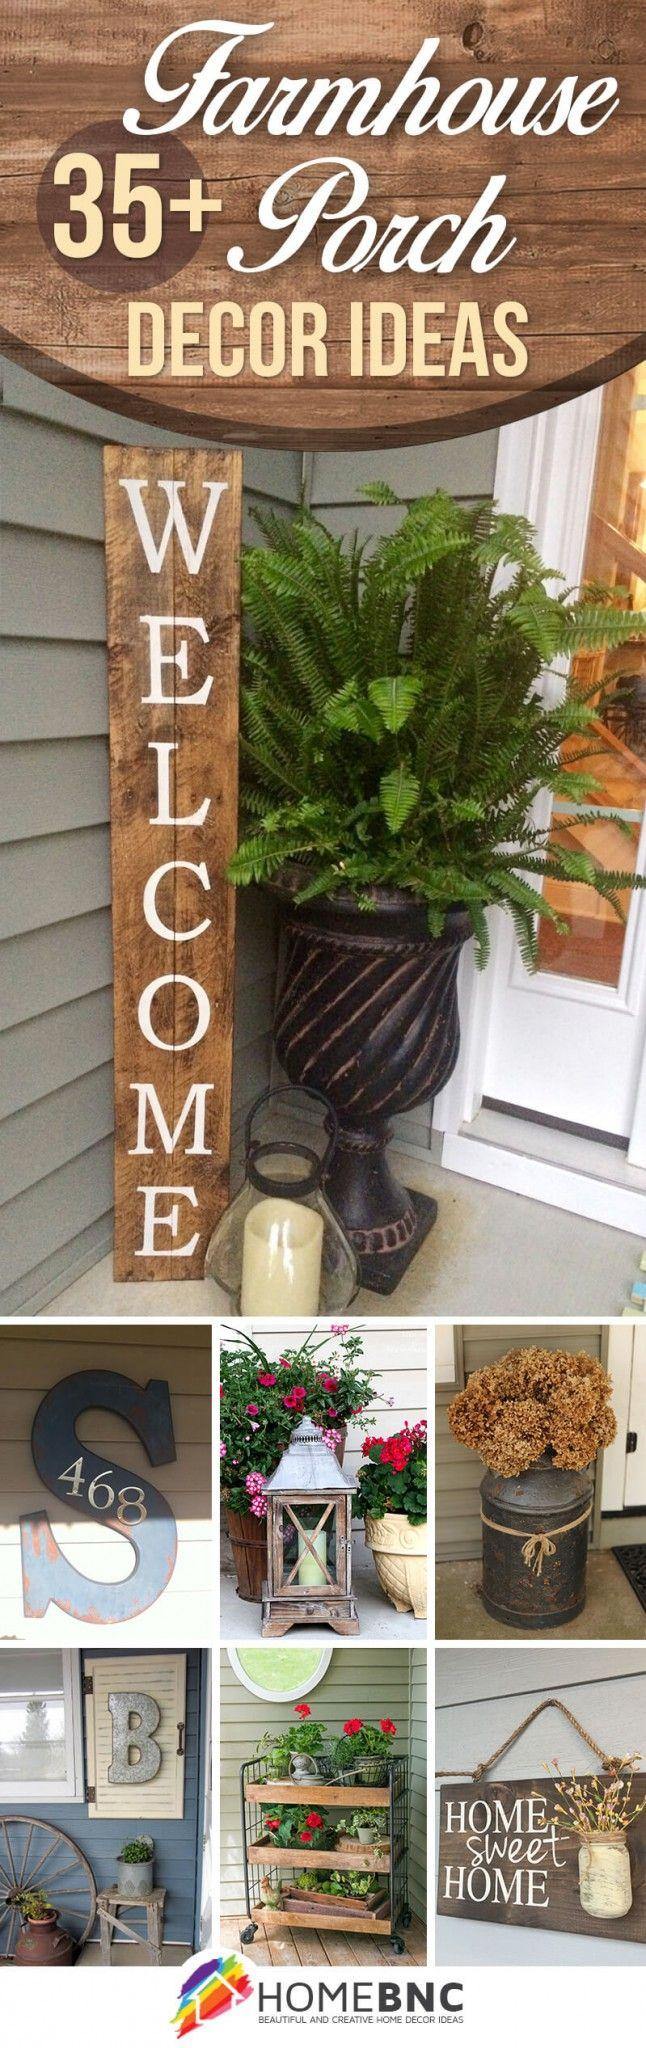 47 Rustic Farmhouse Porch Decor Ideas To Show Off This Season Porch Decorating Front Porch Decorating Farmhouse Decor